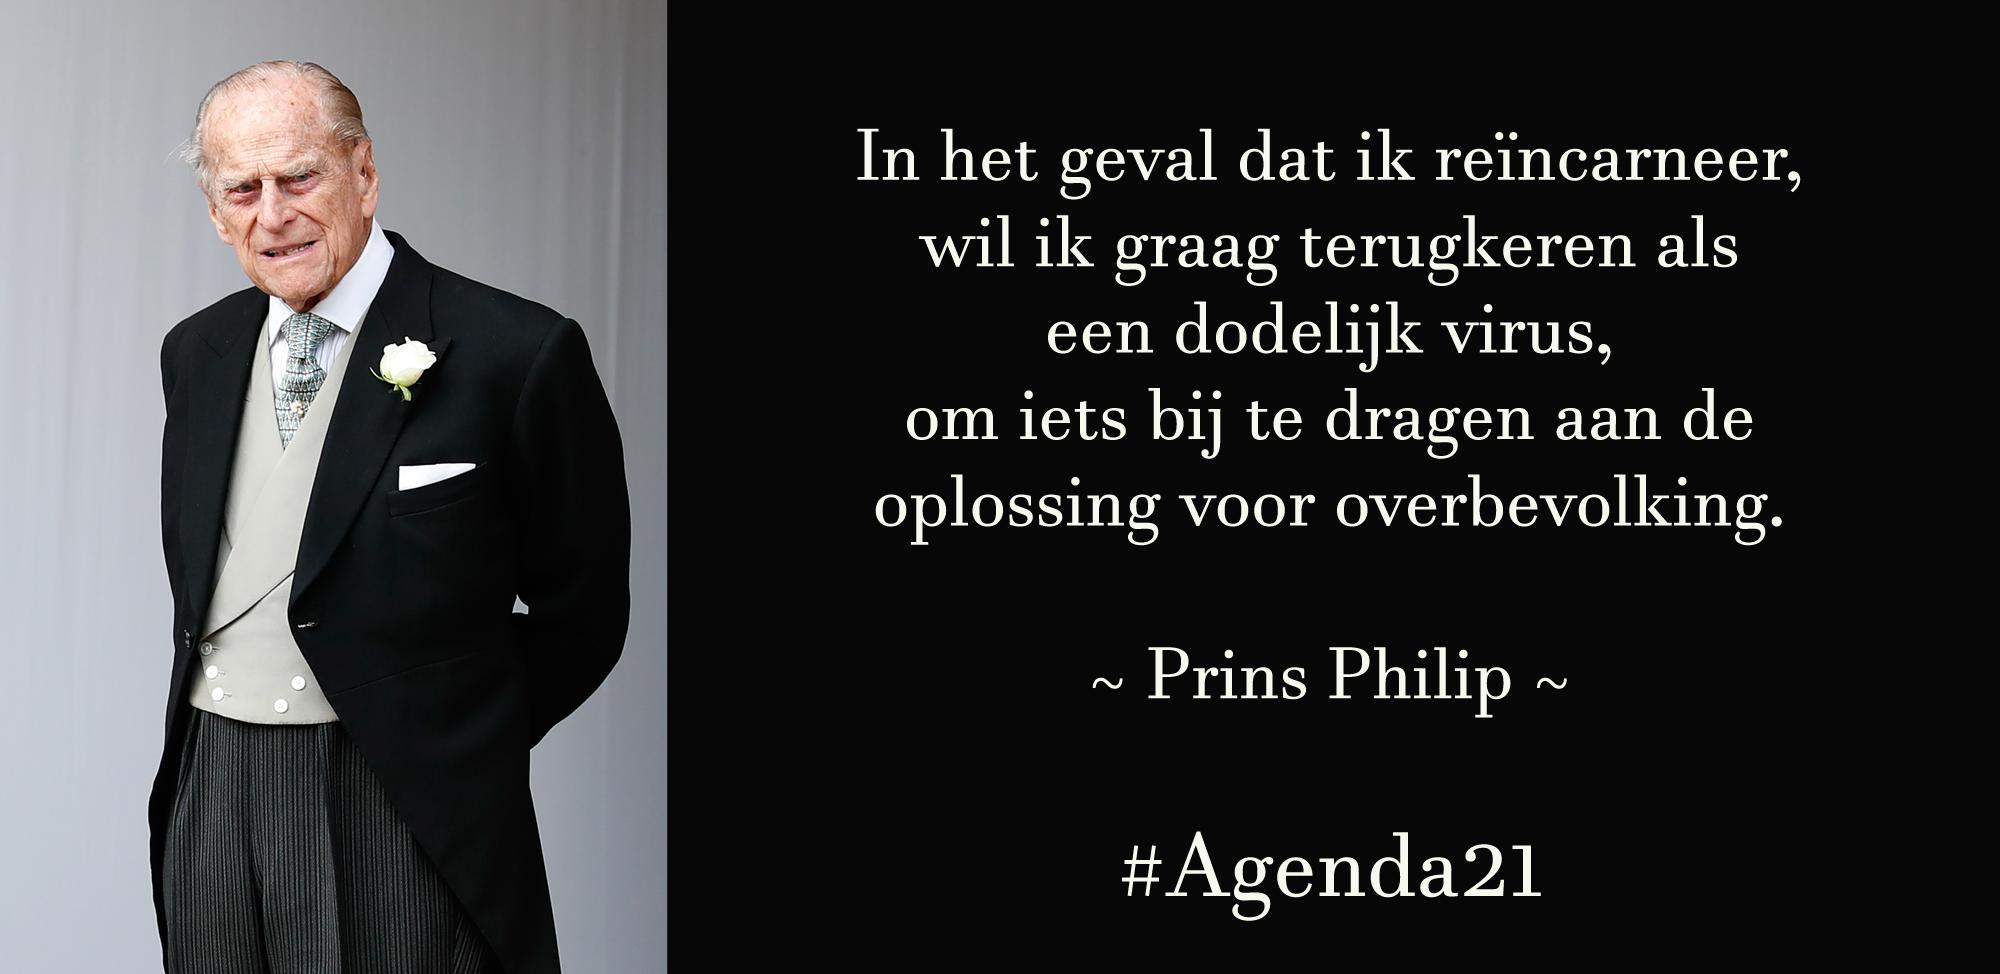 Agenda21-prins-philip.png